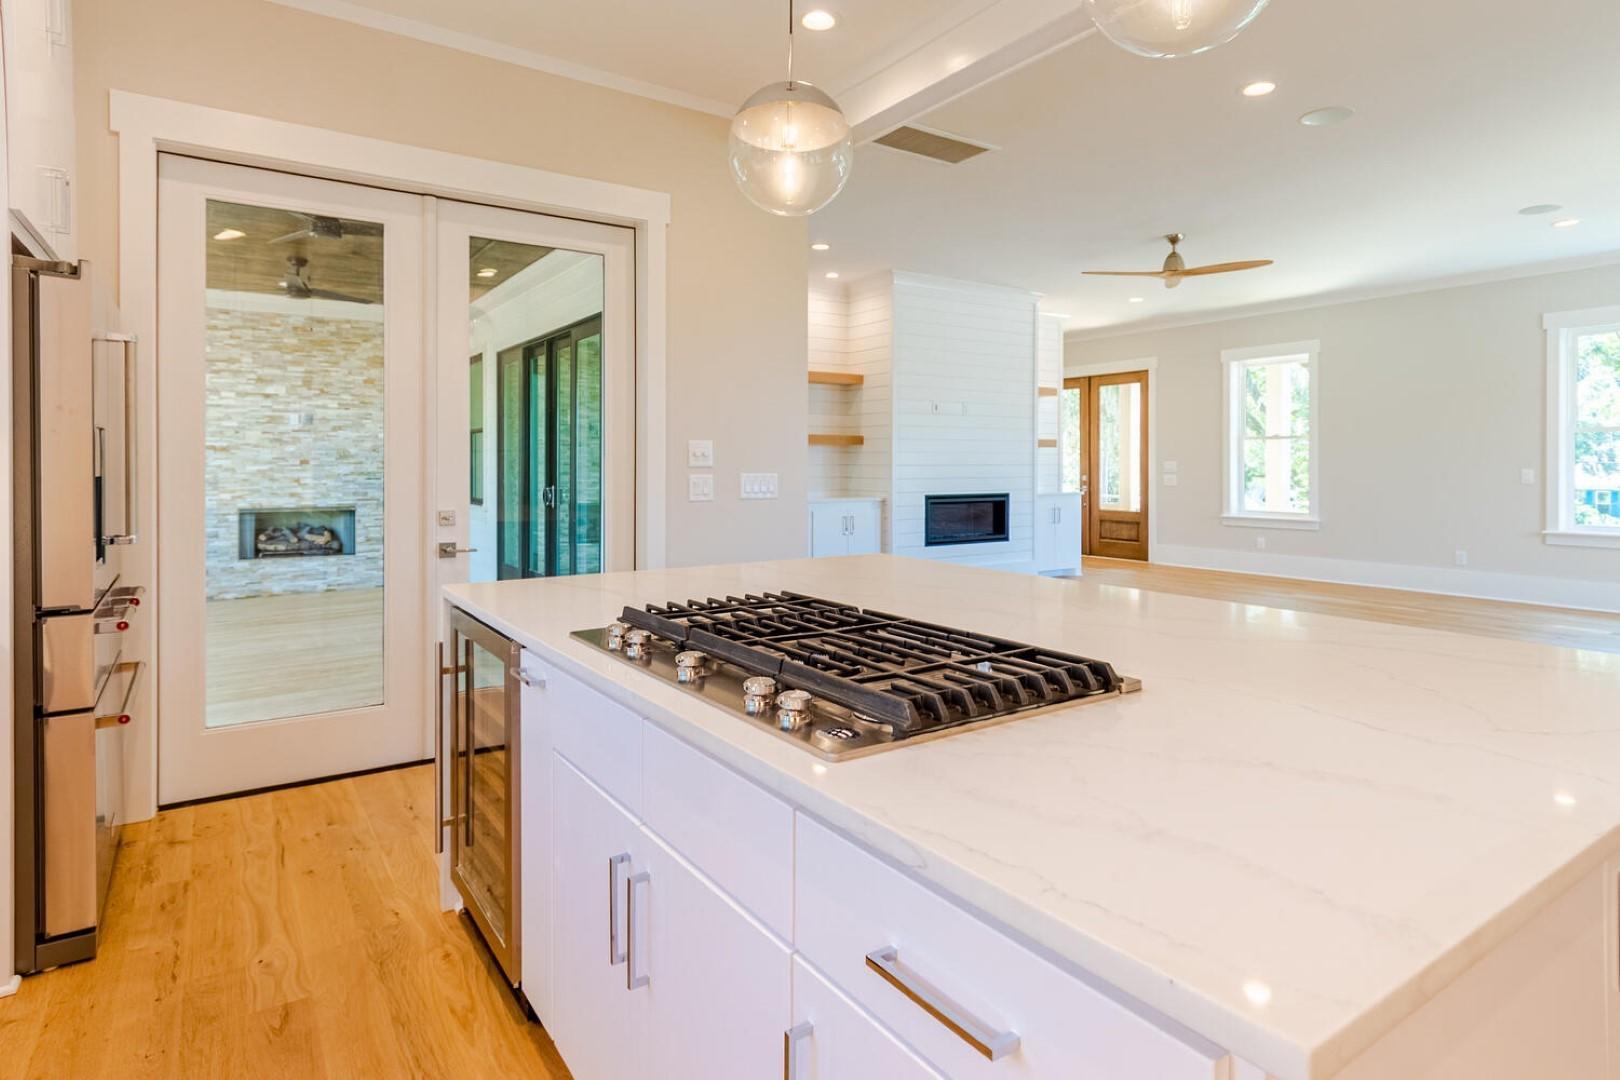 Scanlonville Homes For Sale - 156 5th, Mount Pleasant, SC - 11